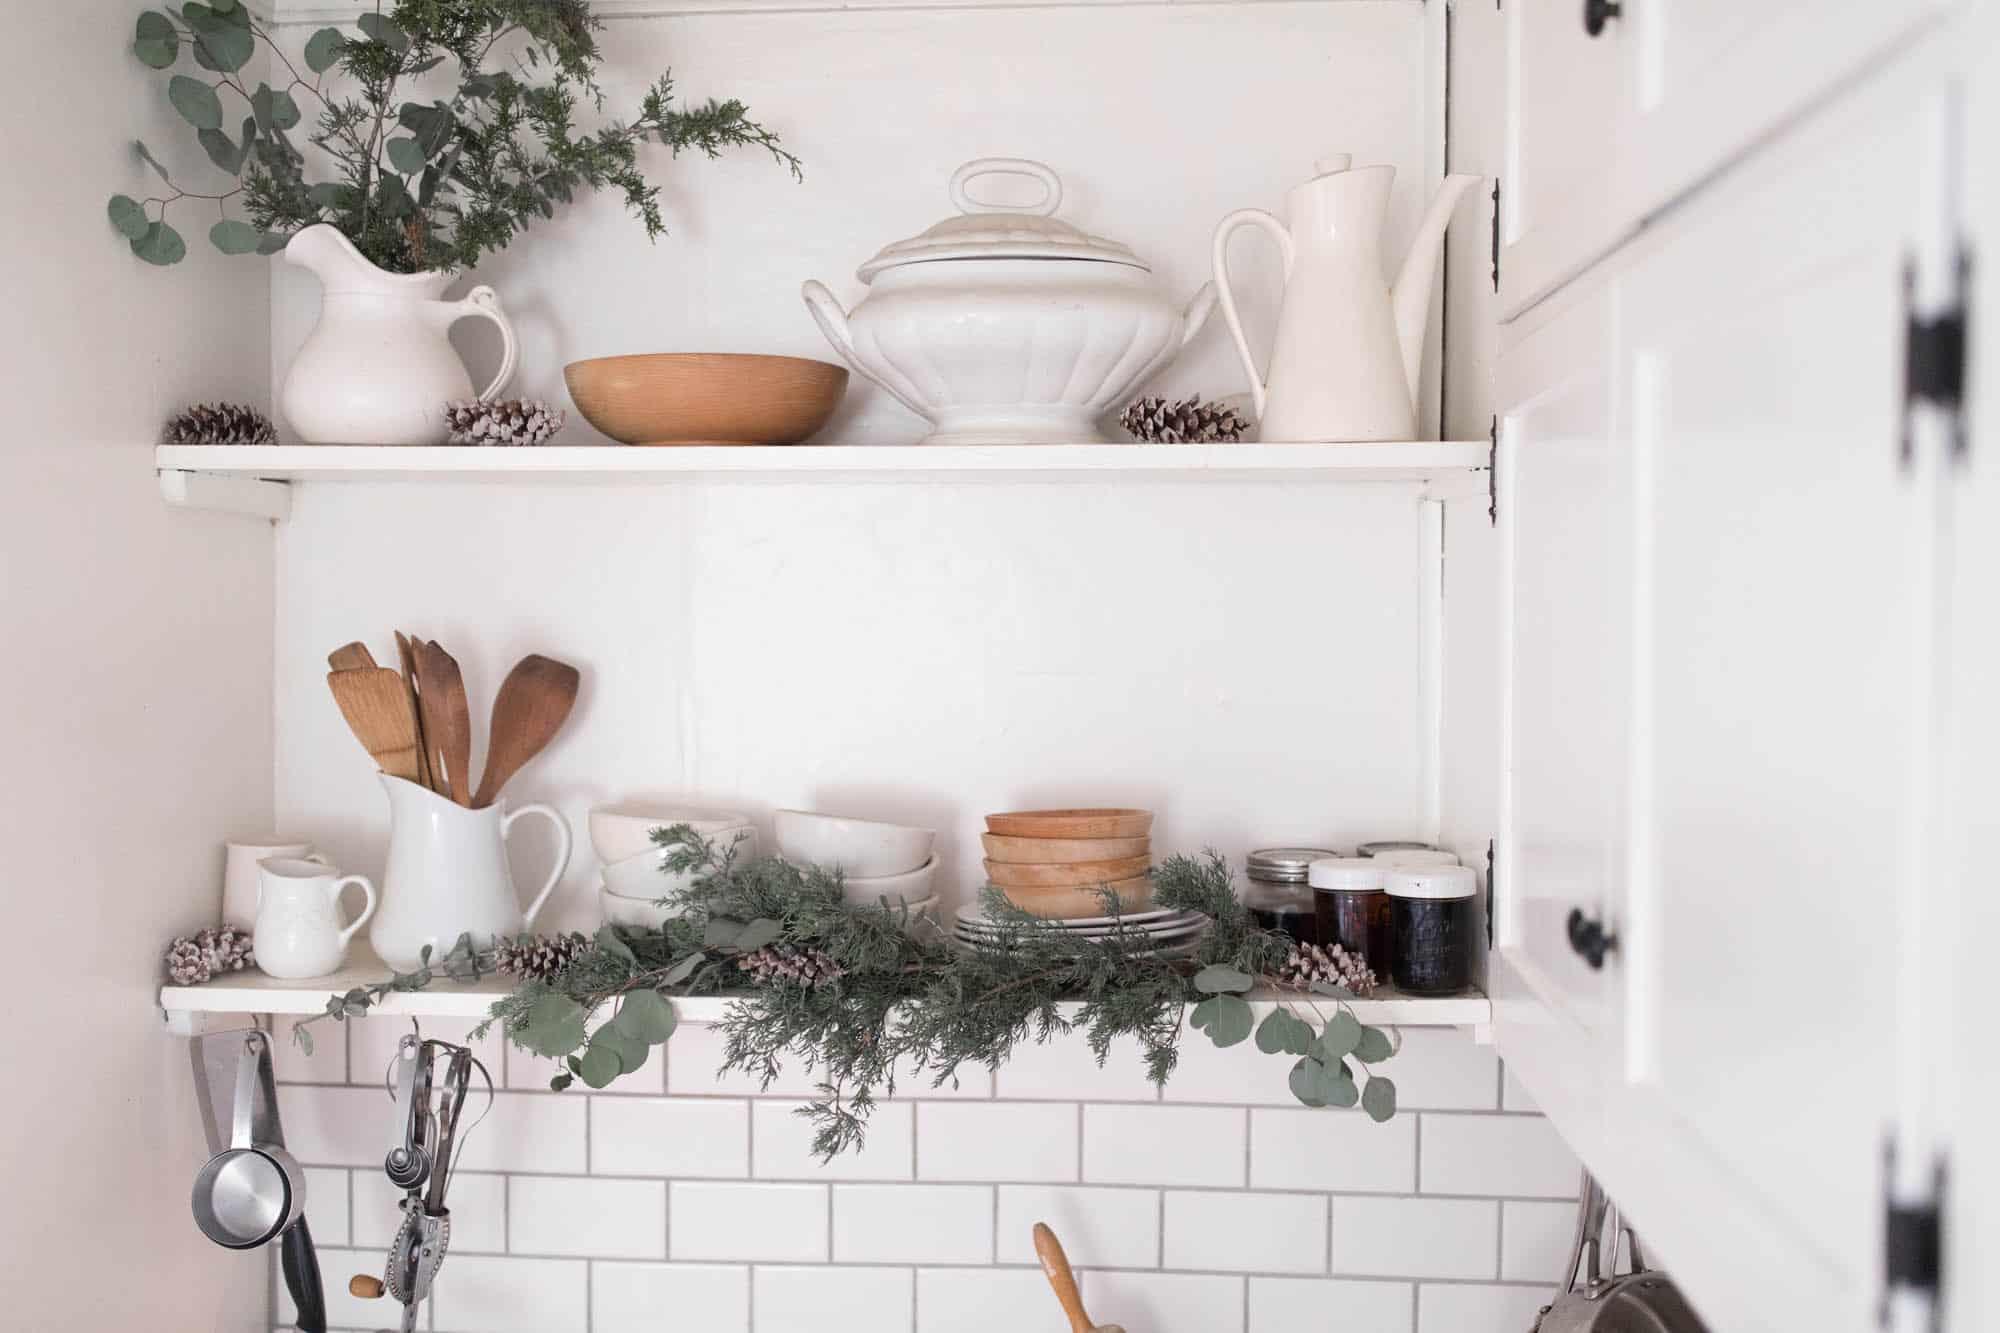 Farmhouse Christmas Kitchen Open Shelving Fresh Greenery